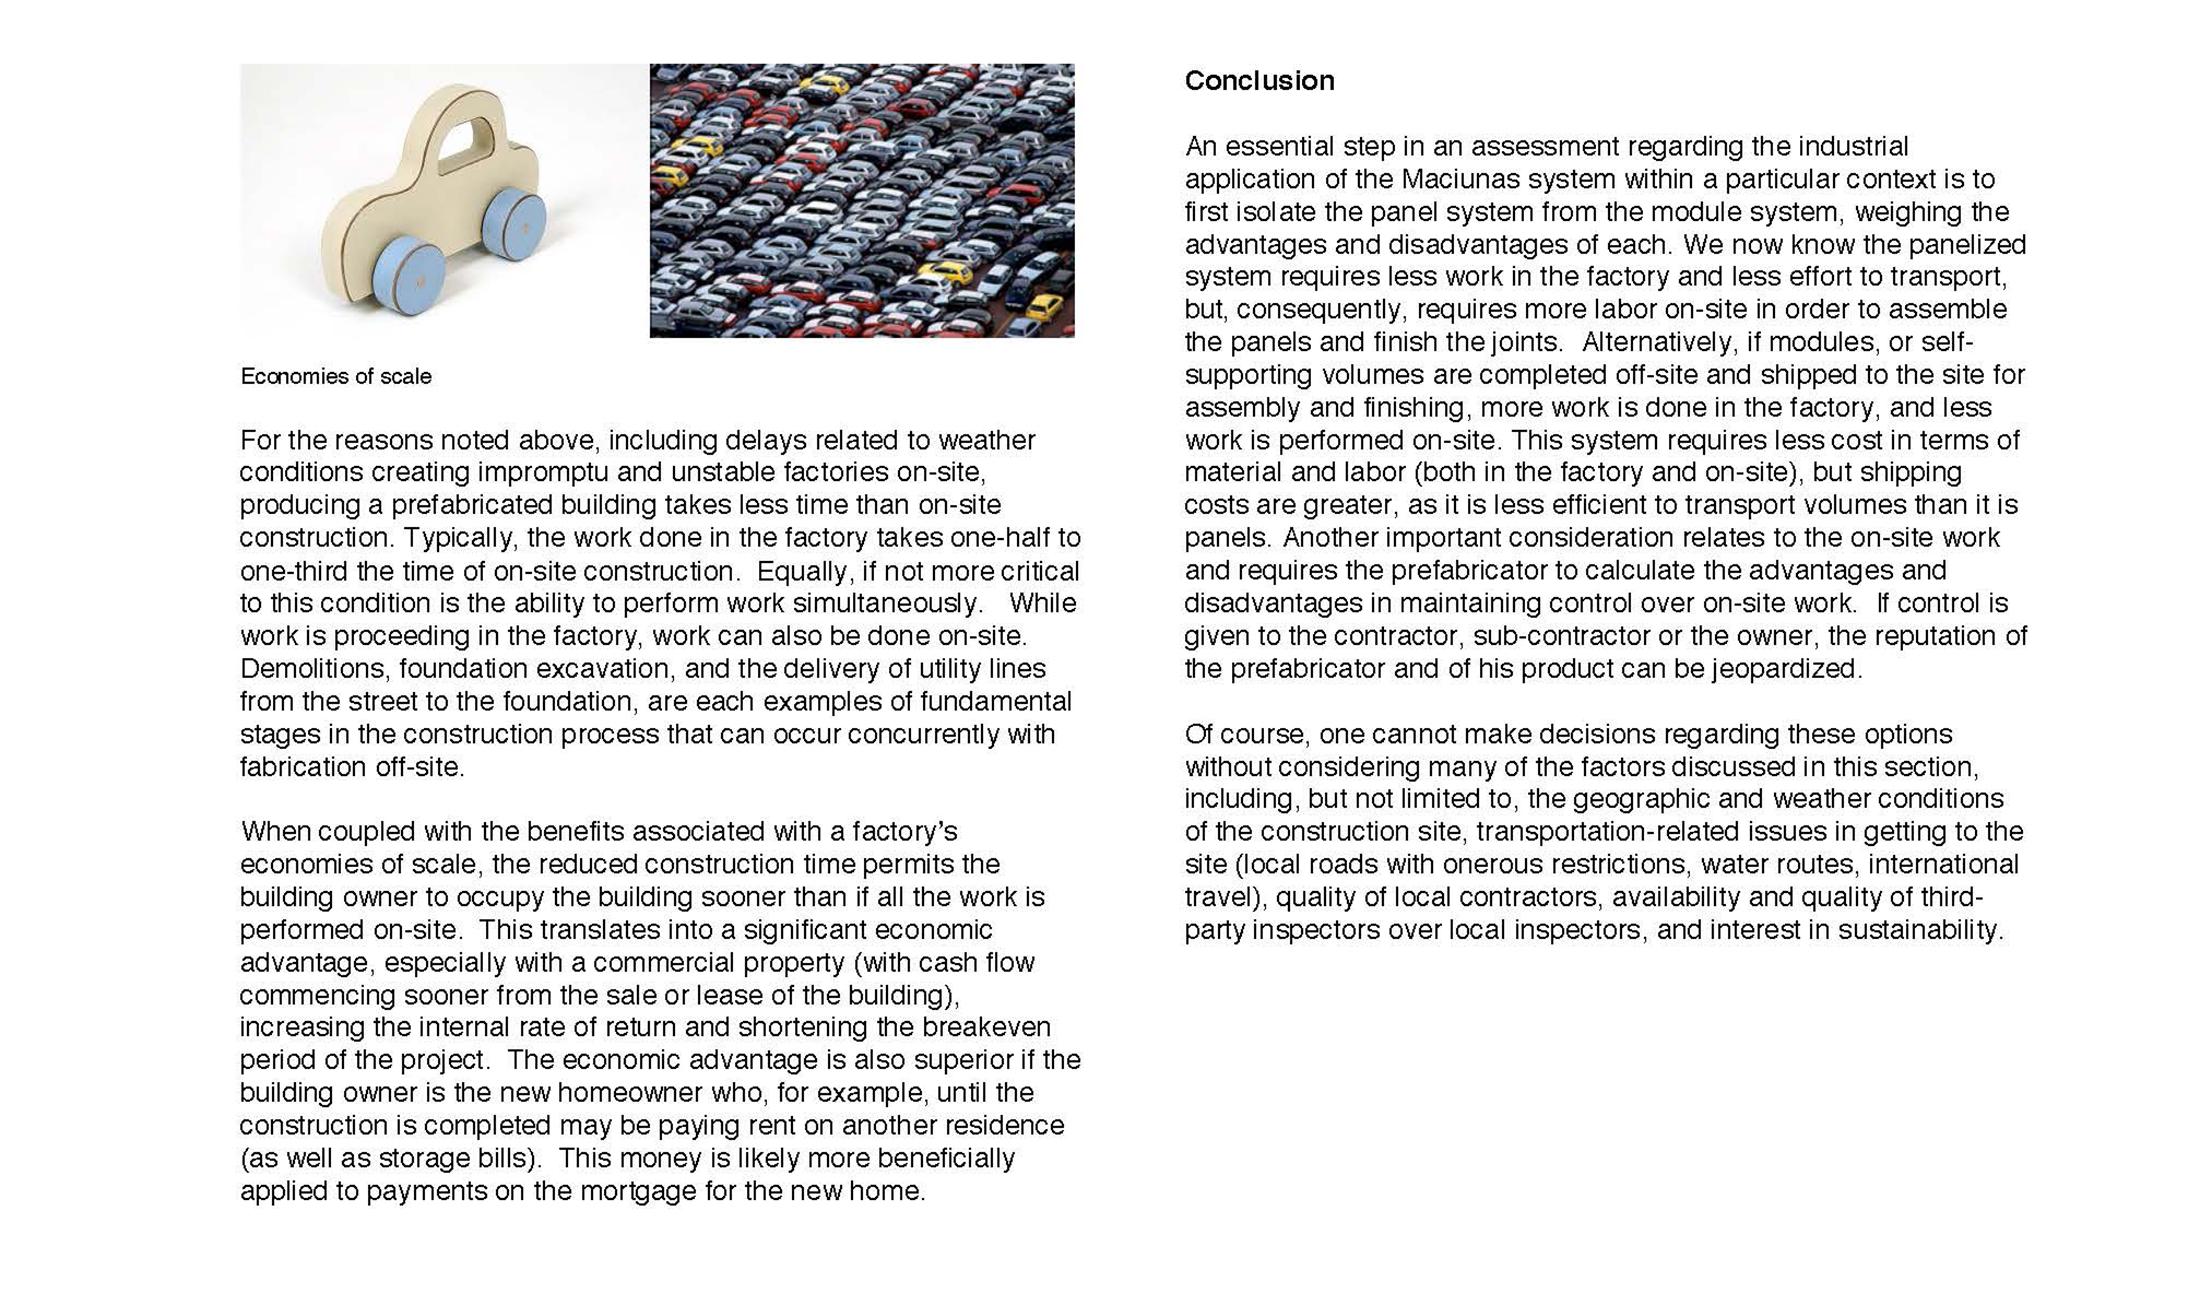 Maciunas Assessment Report 0509_Page_25.jpg